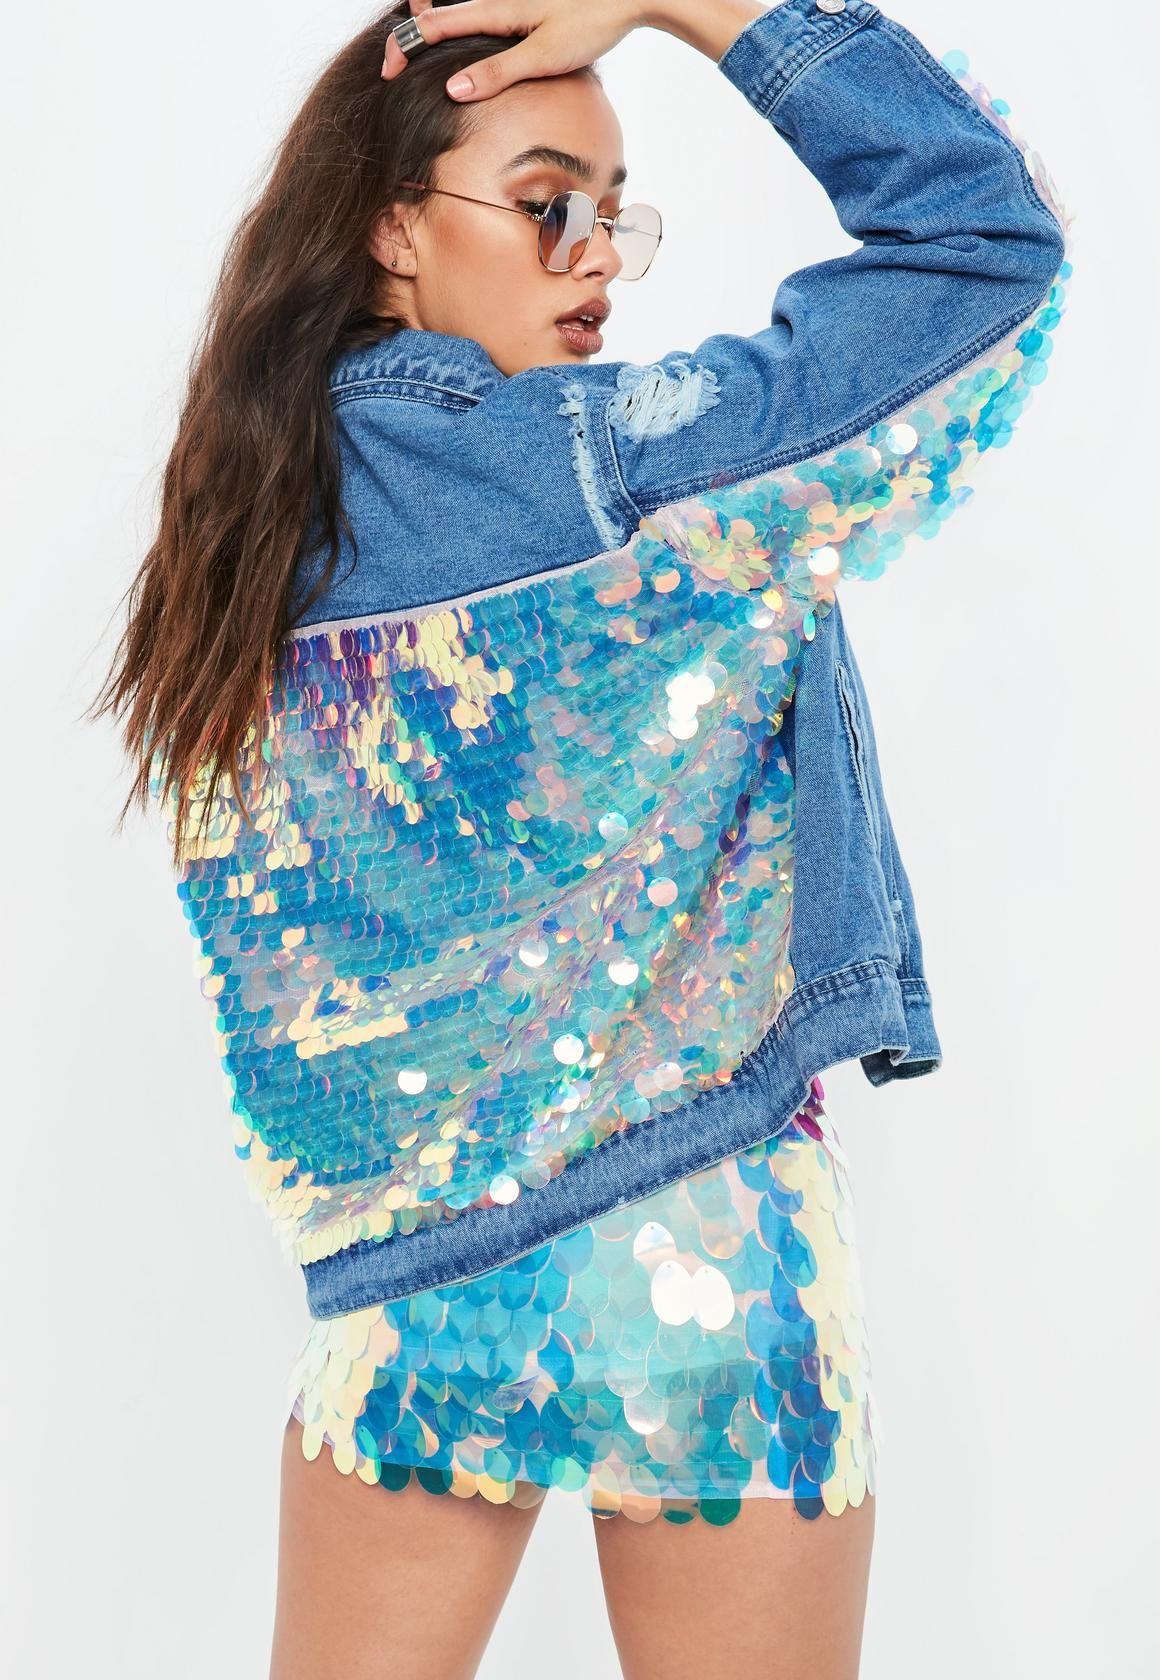 65c6f3edb176b Blue Denim All Over Back Mermaid Sequin Jacket